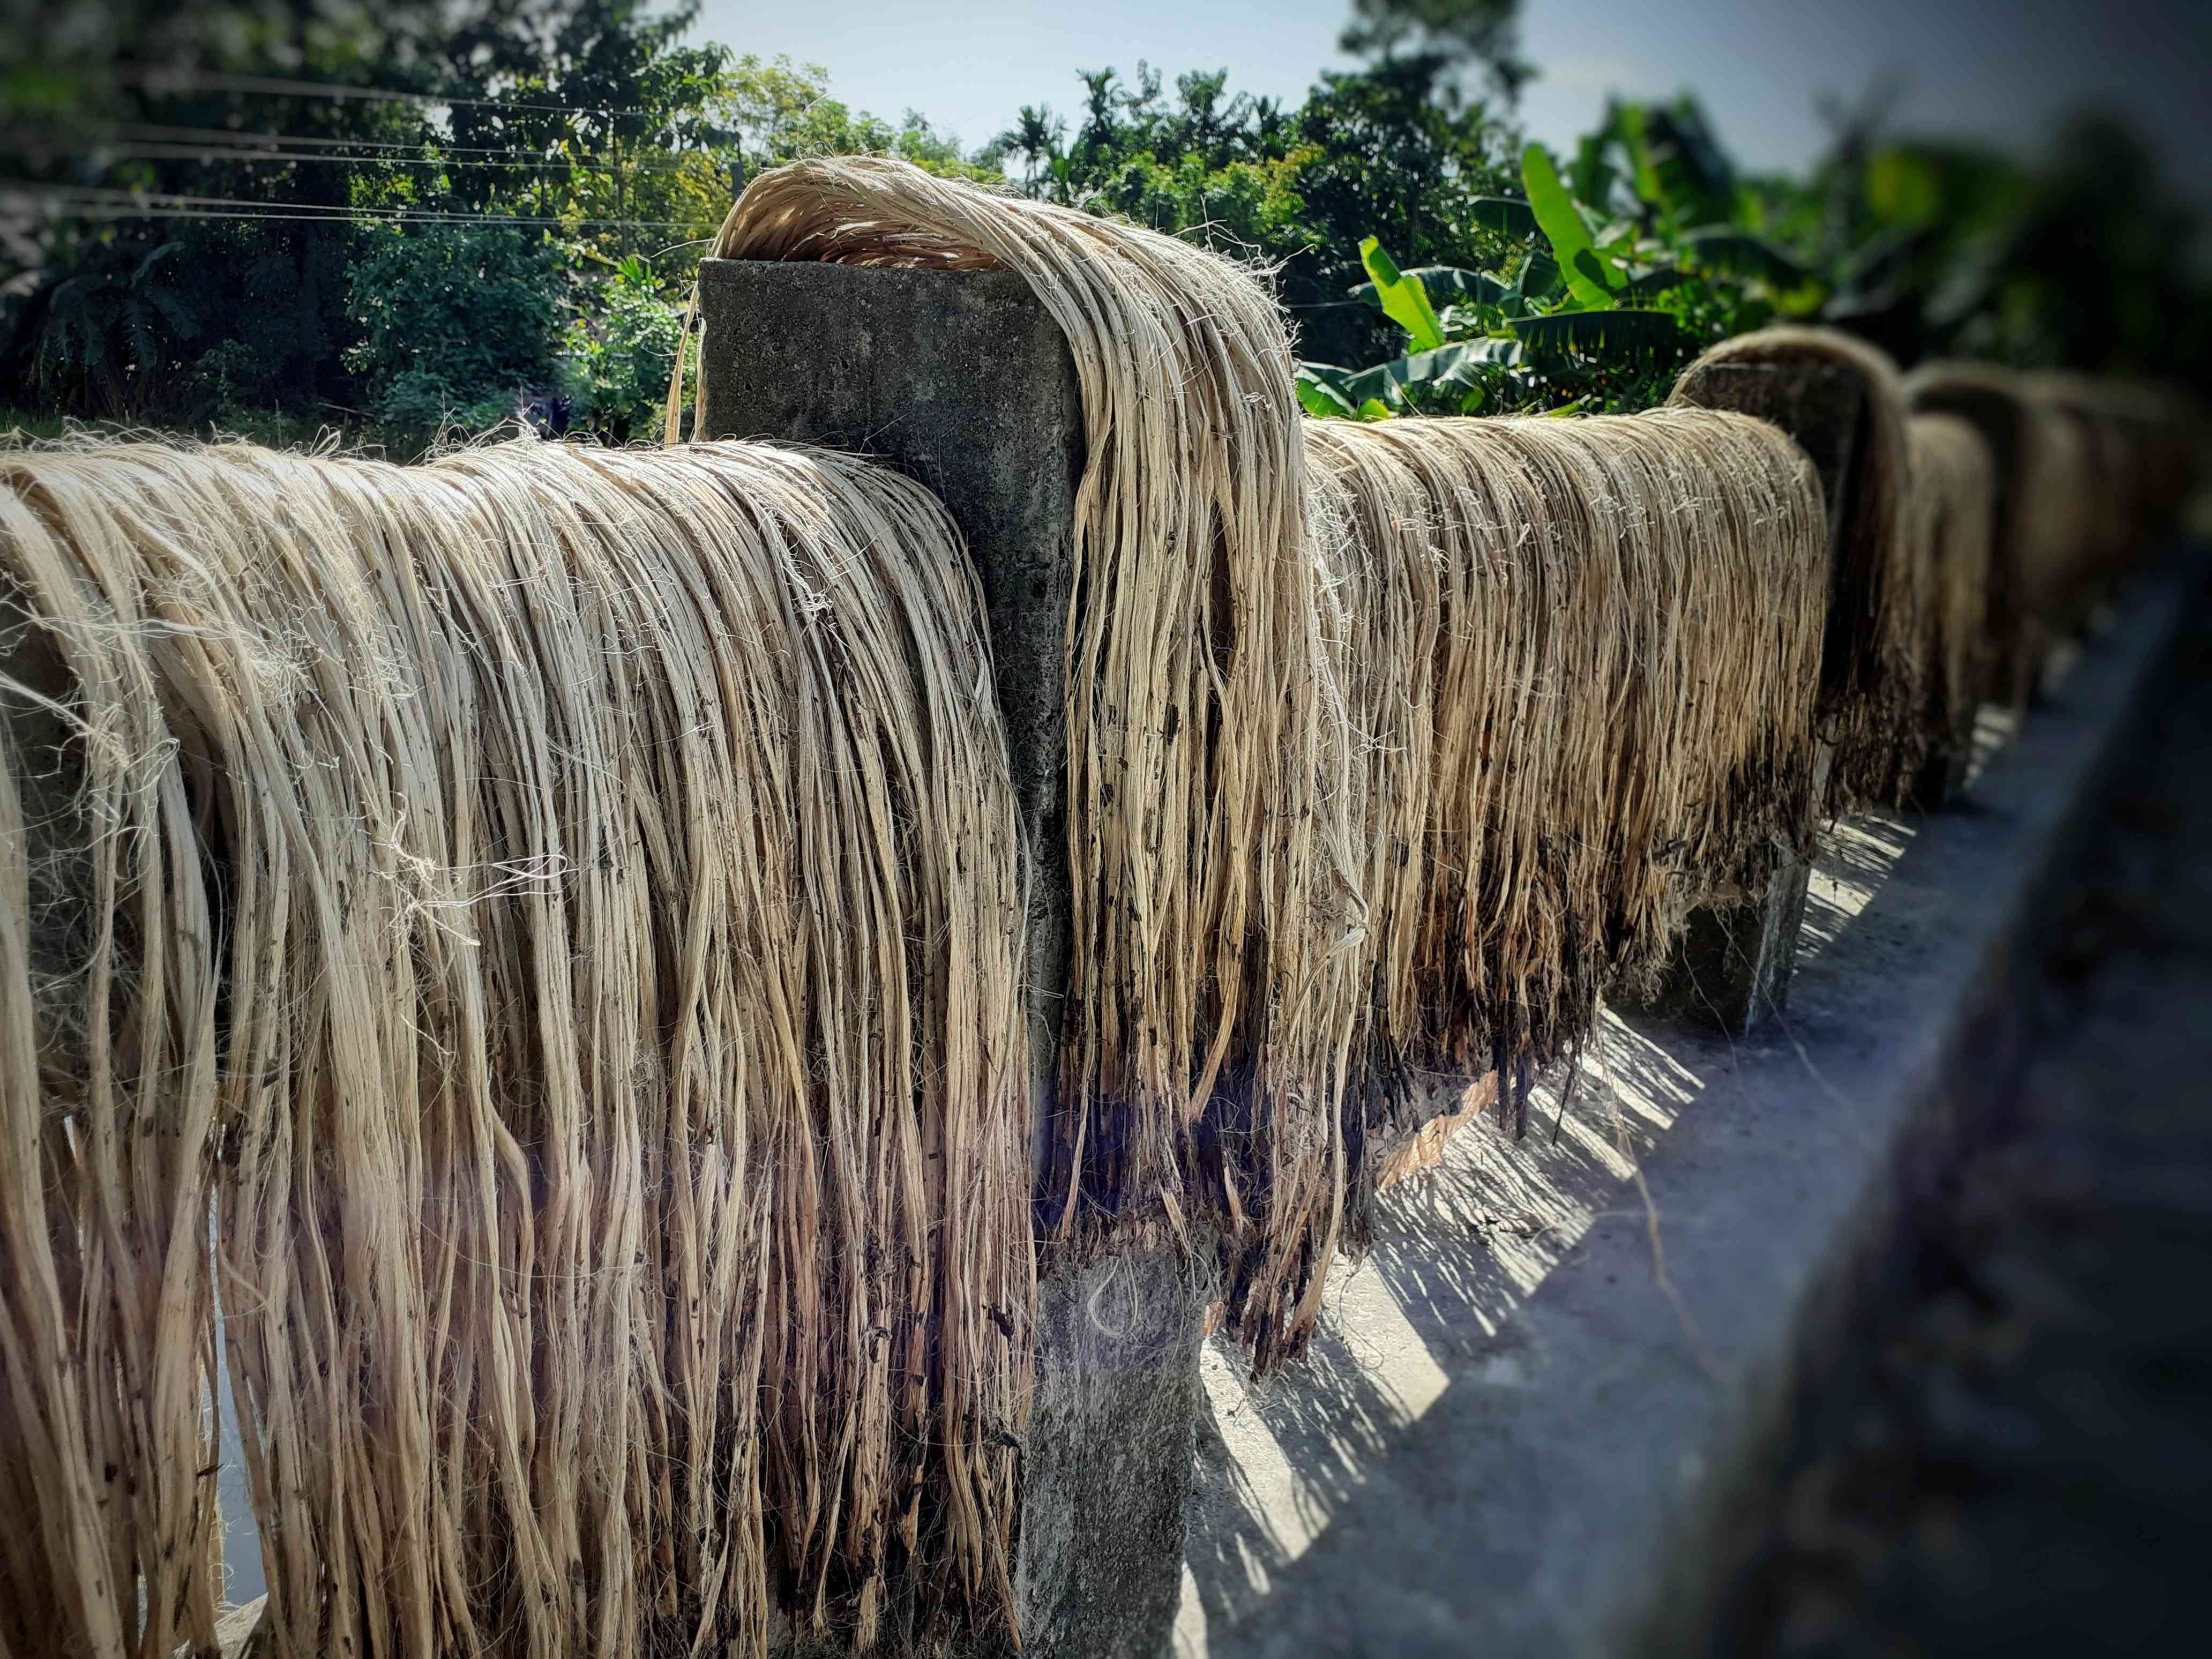 Raw jute fiber hanging for sun drying